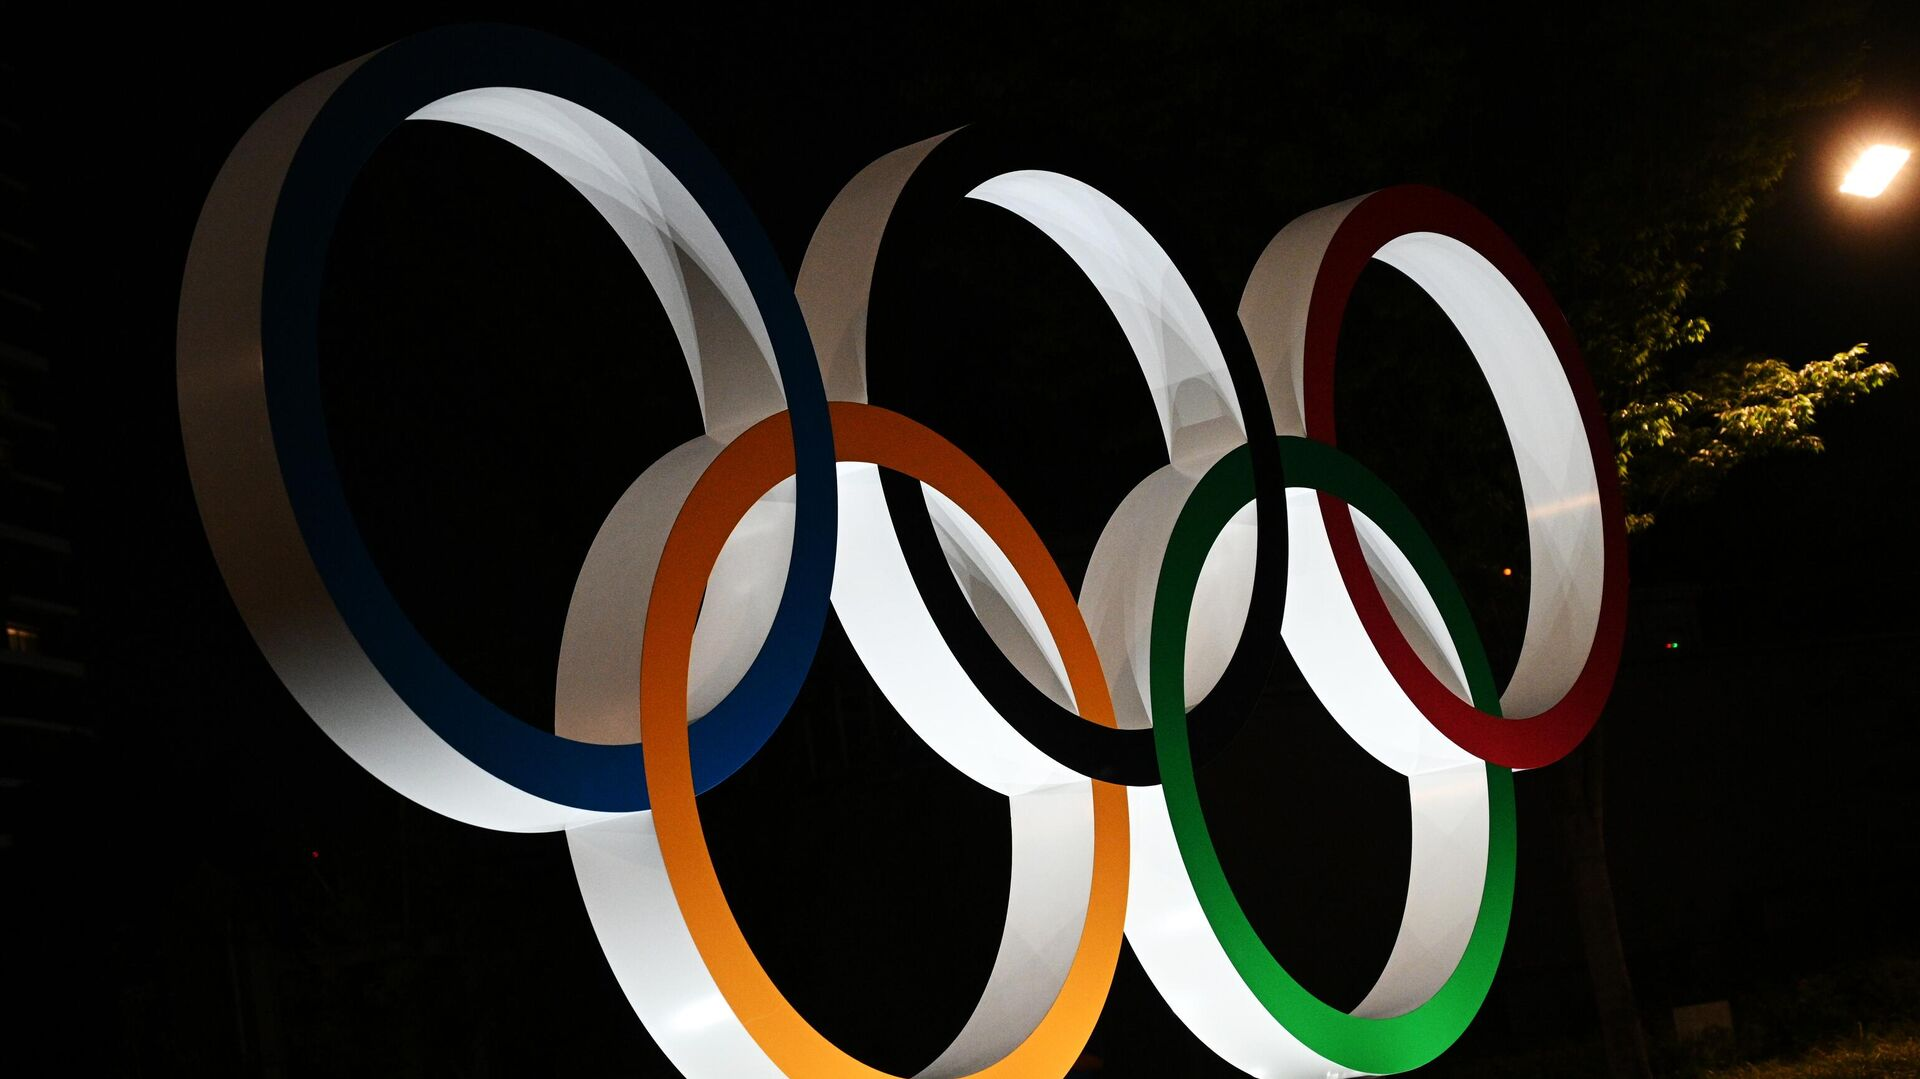 Токио накануне открытия Олимпийских игр - РИА Новости, 1920, 23.09.2021